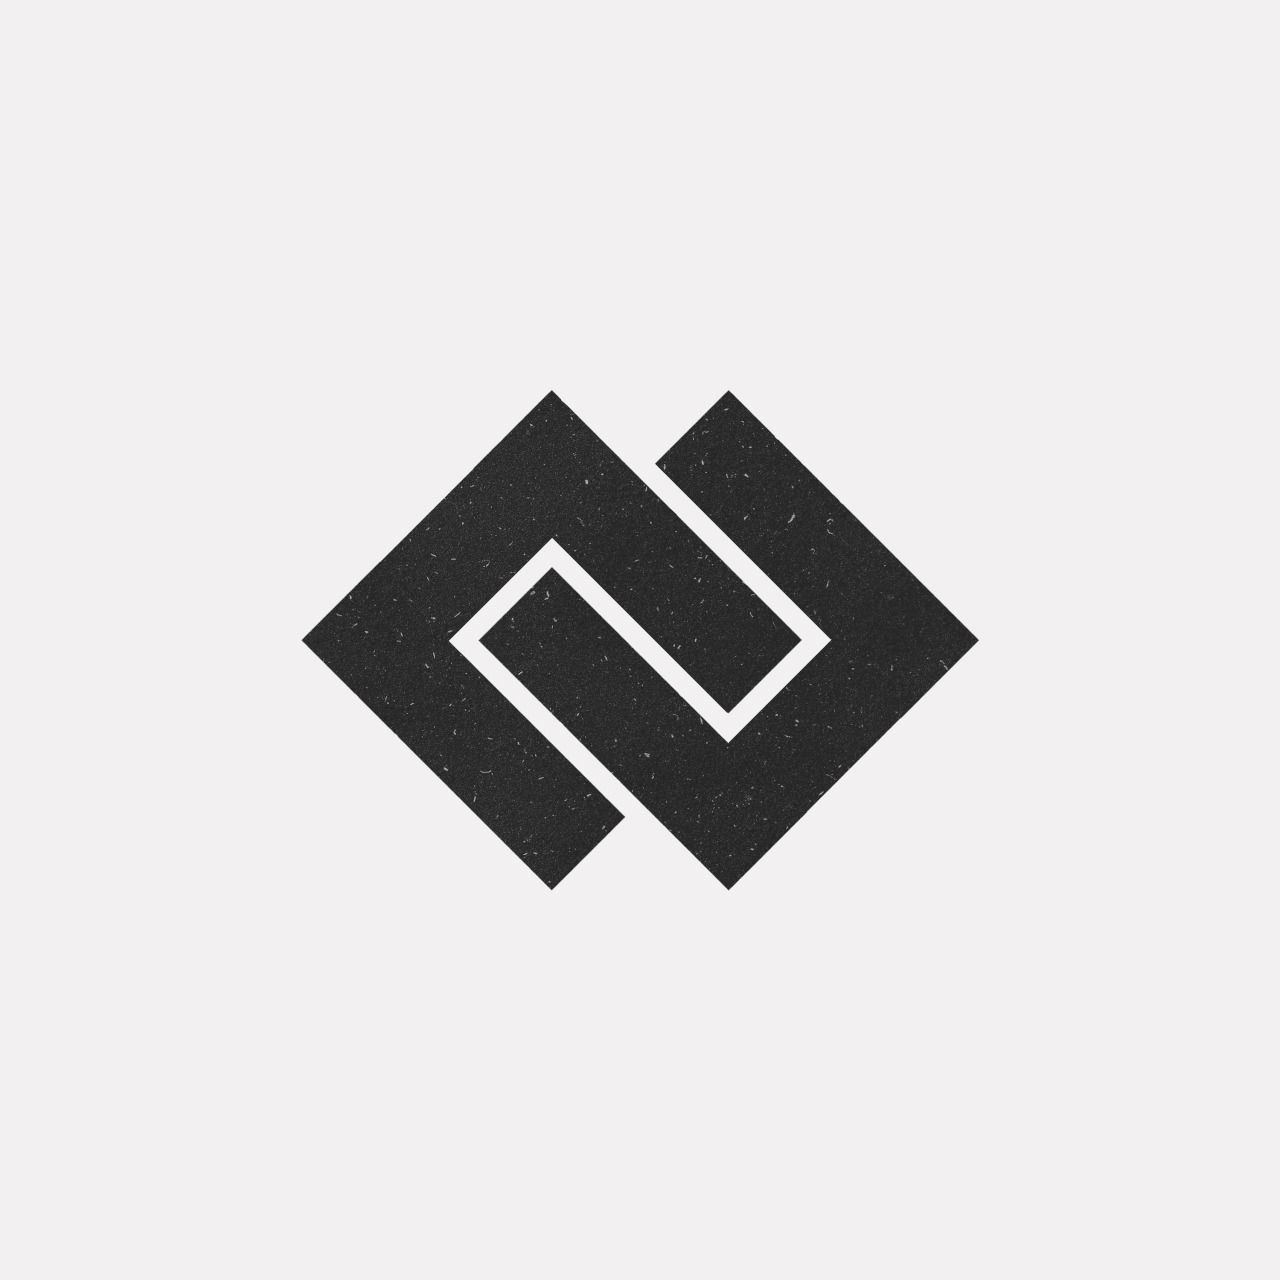 ma16527 a new geometric design every day 20160803